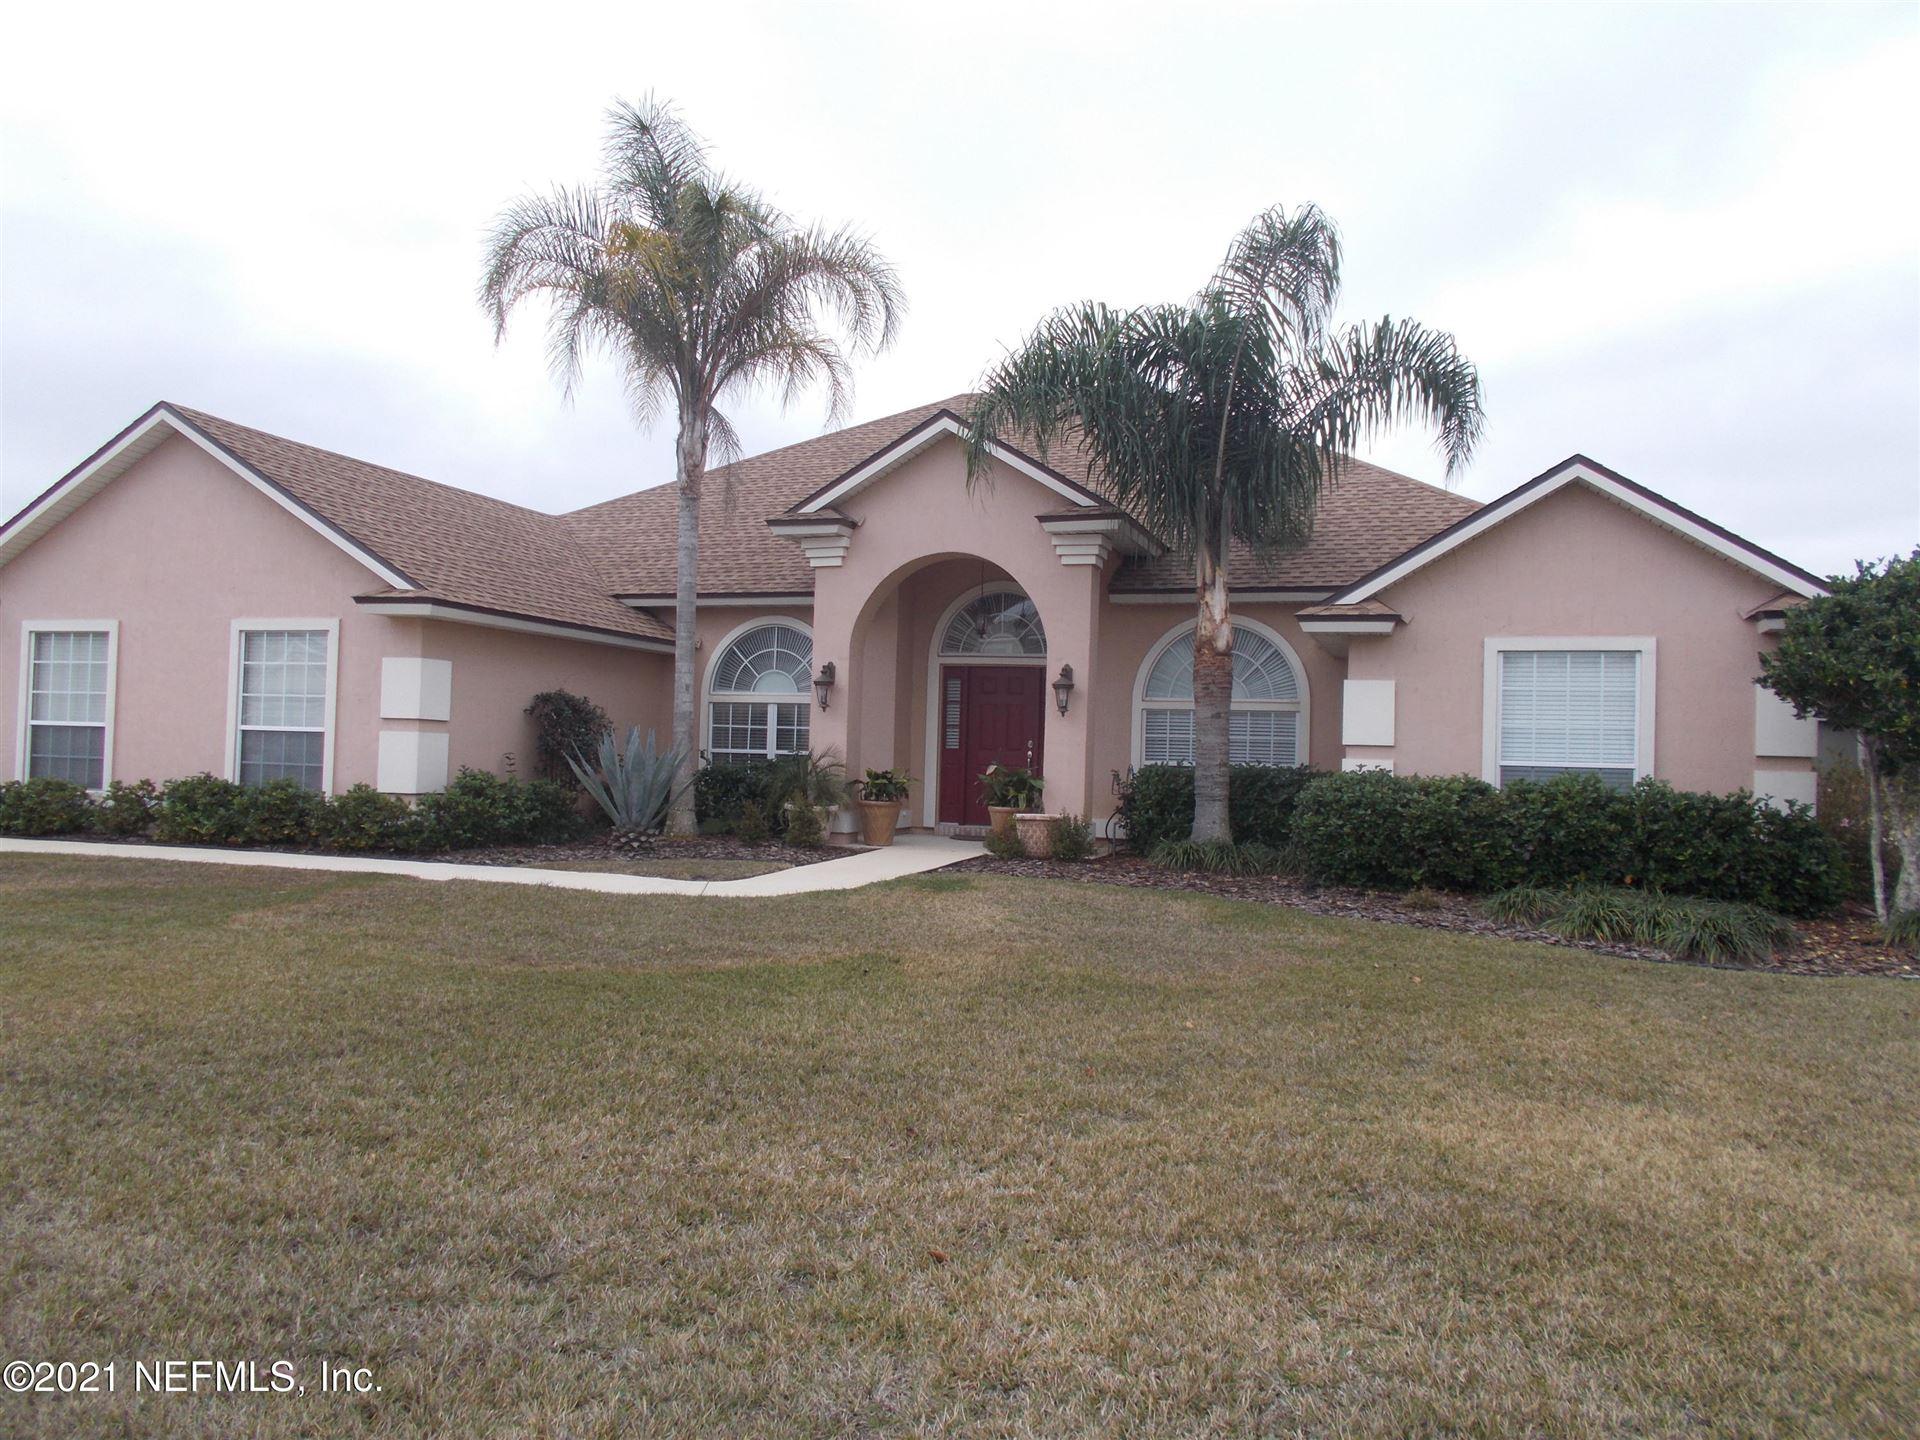 111 PRINCE PHILLIP DR, Saint Augustine, FL 32092 - MLS#: 1090259